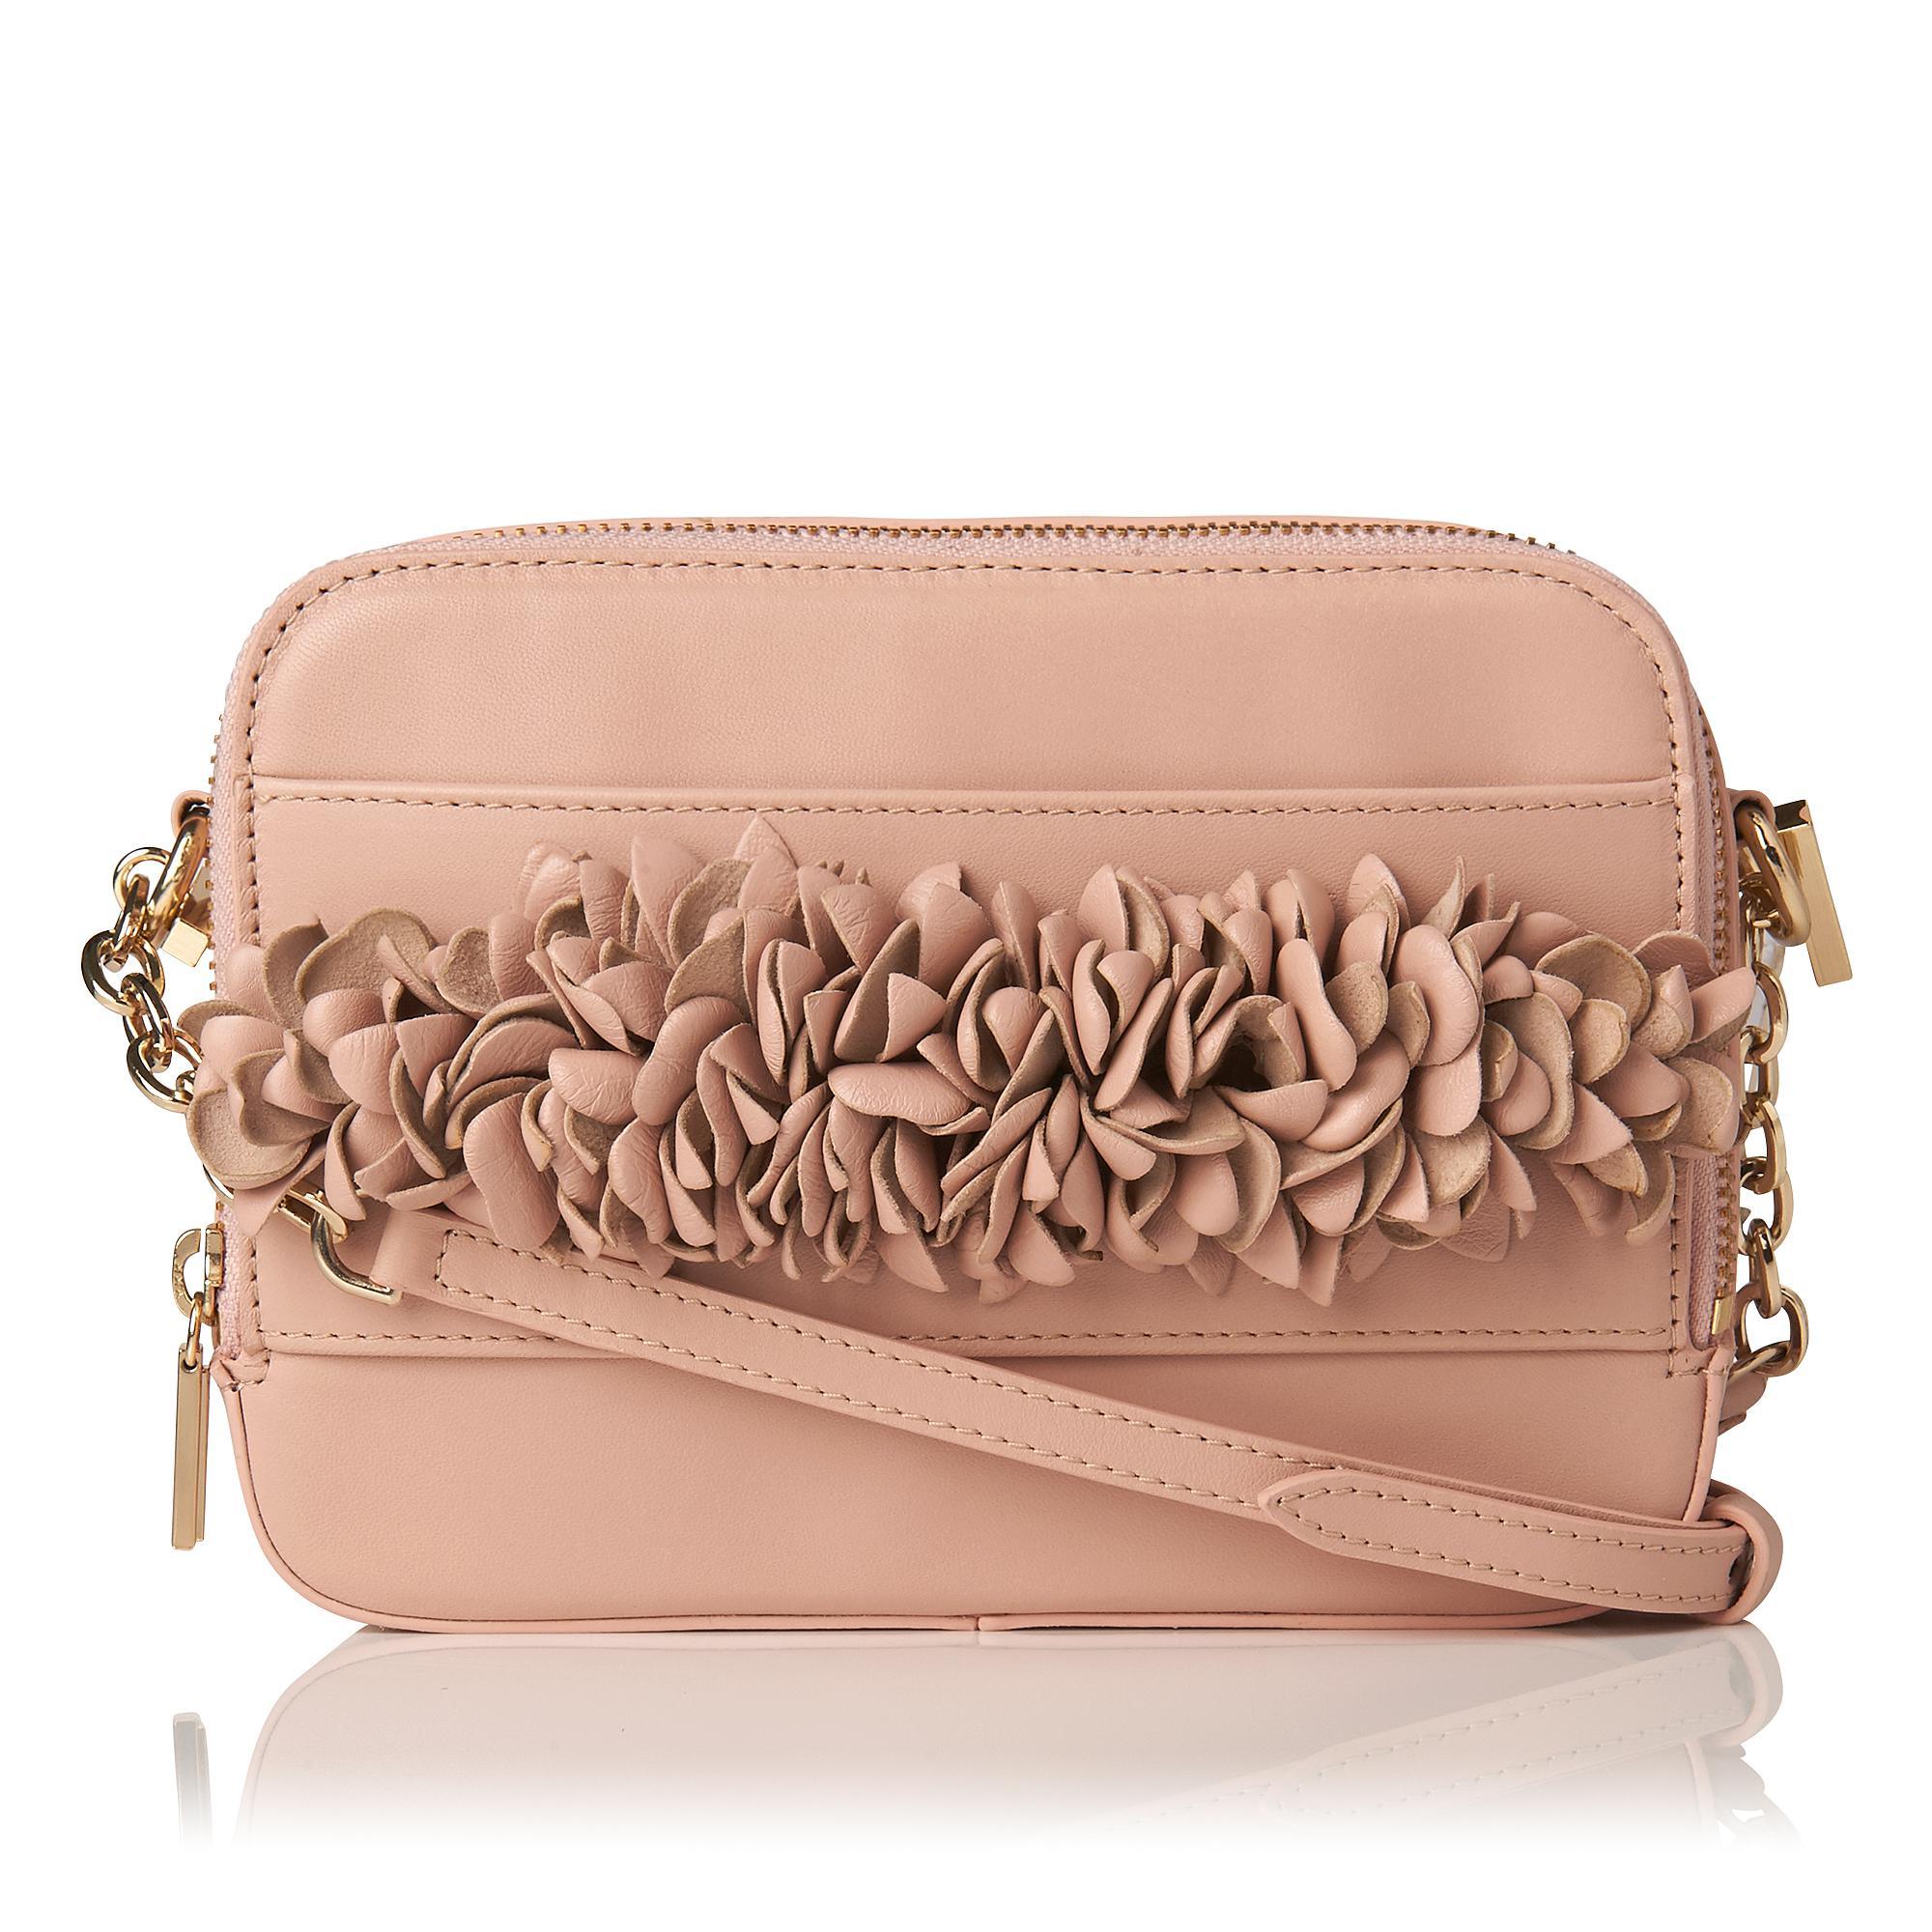 L.K.Bennett Mia Crossbody Bag